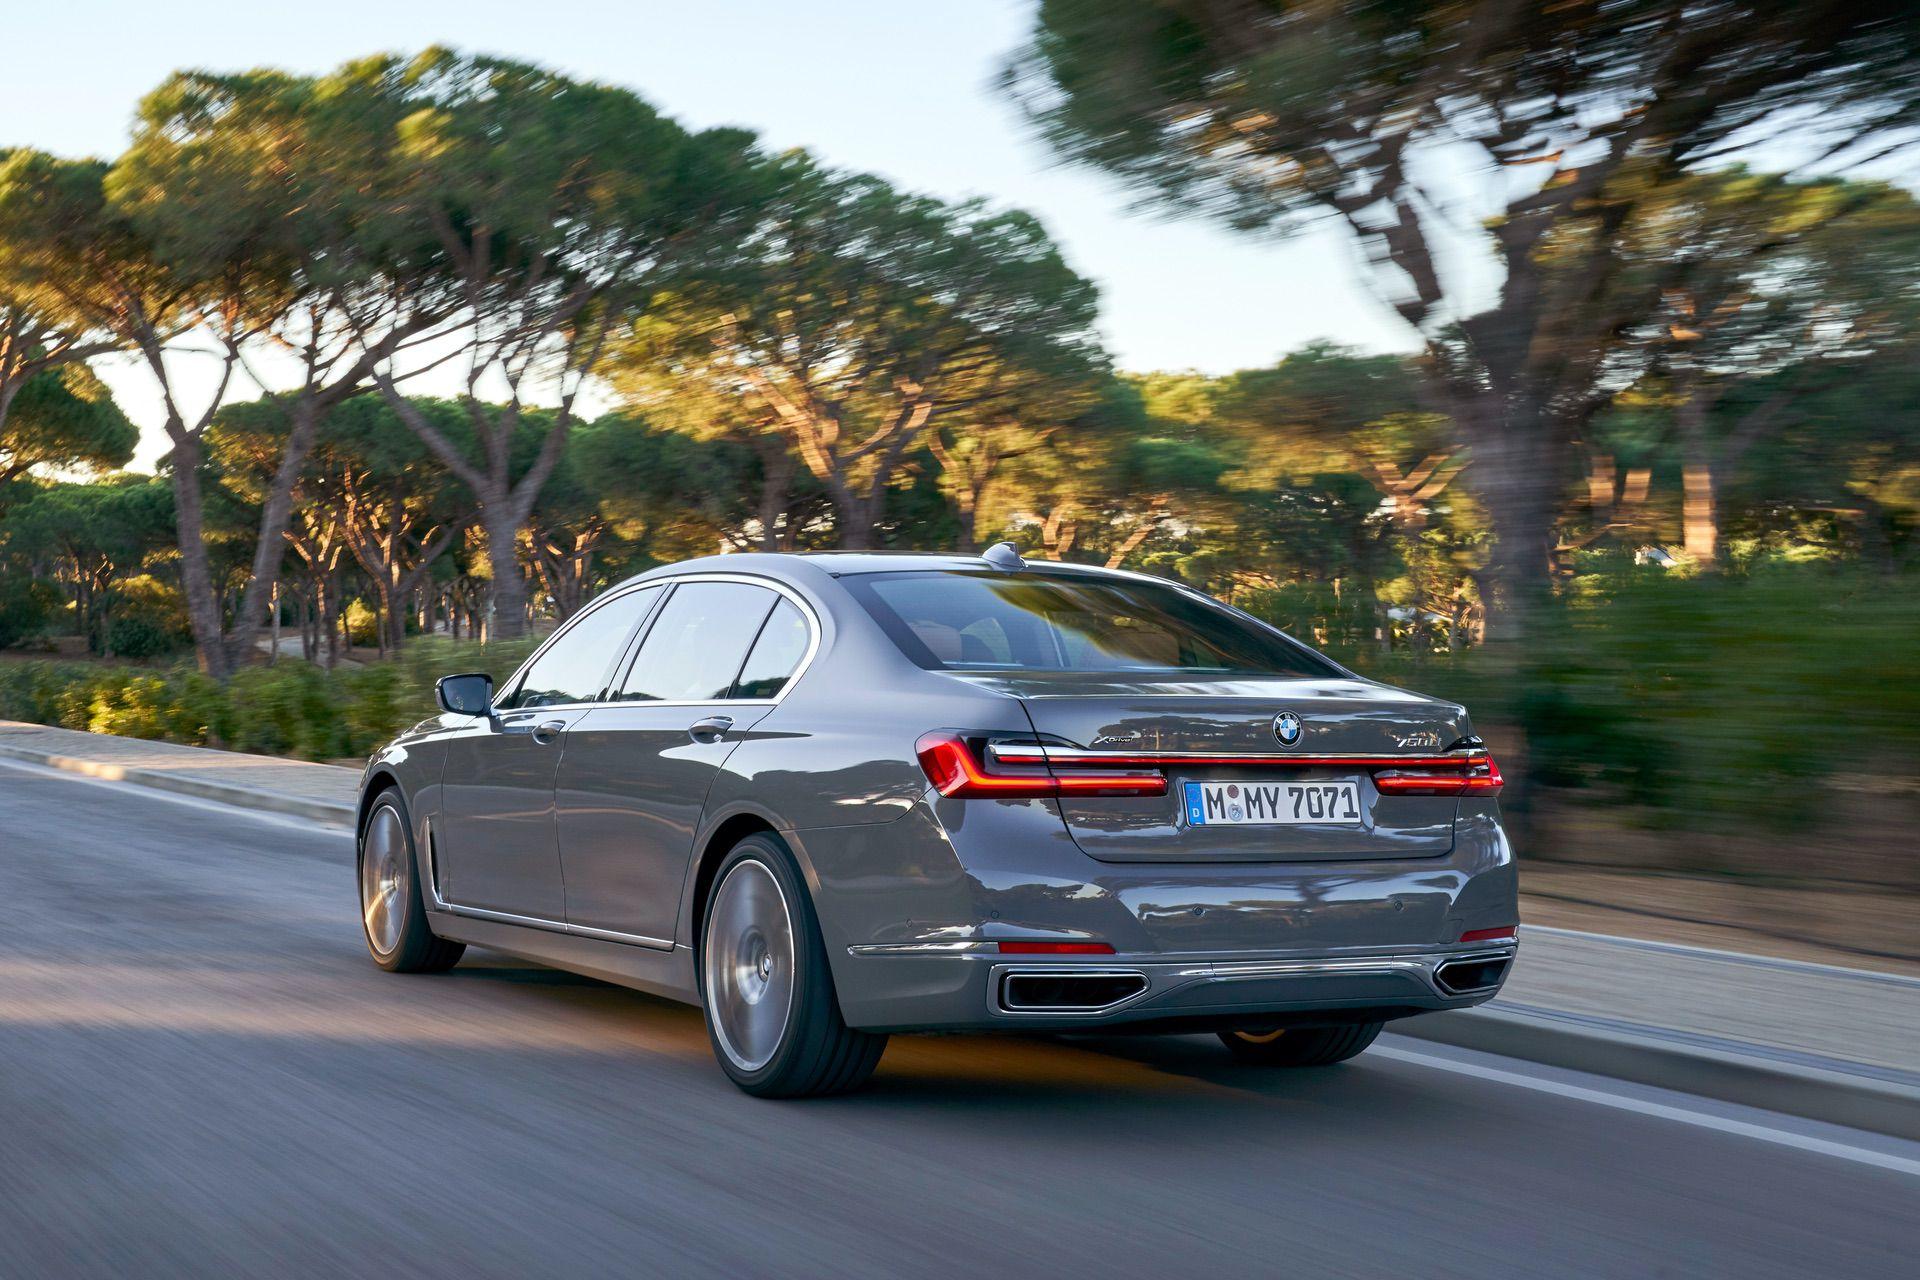 TEST DRIVE: 2019 BMW 750Li xDrive - A Promising Reboot Of ...